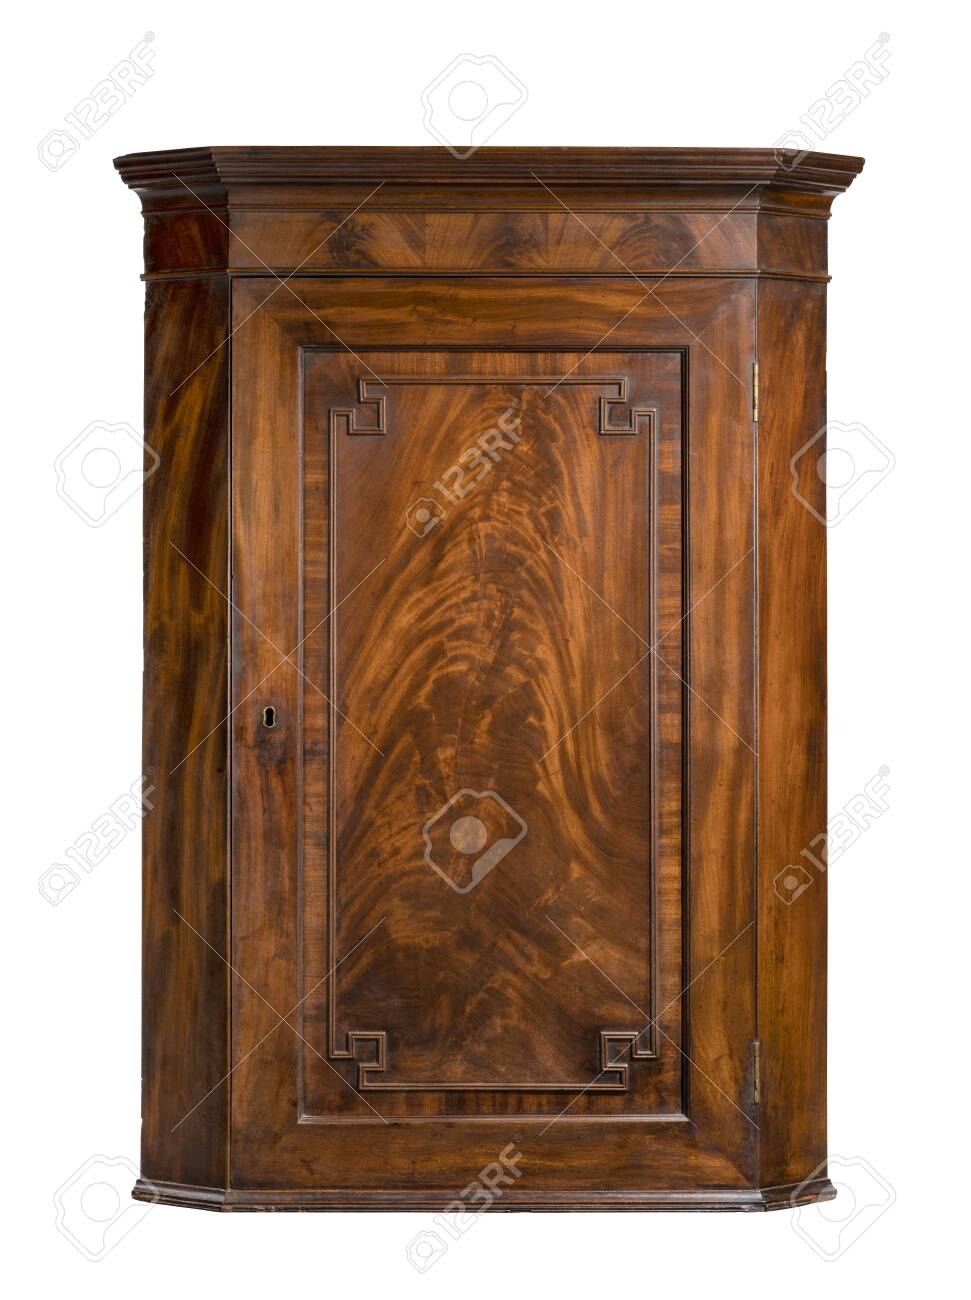 vintage mahogany hanging wall corner cupboard - 137421598